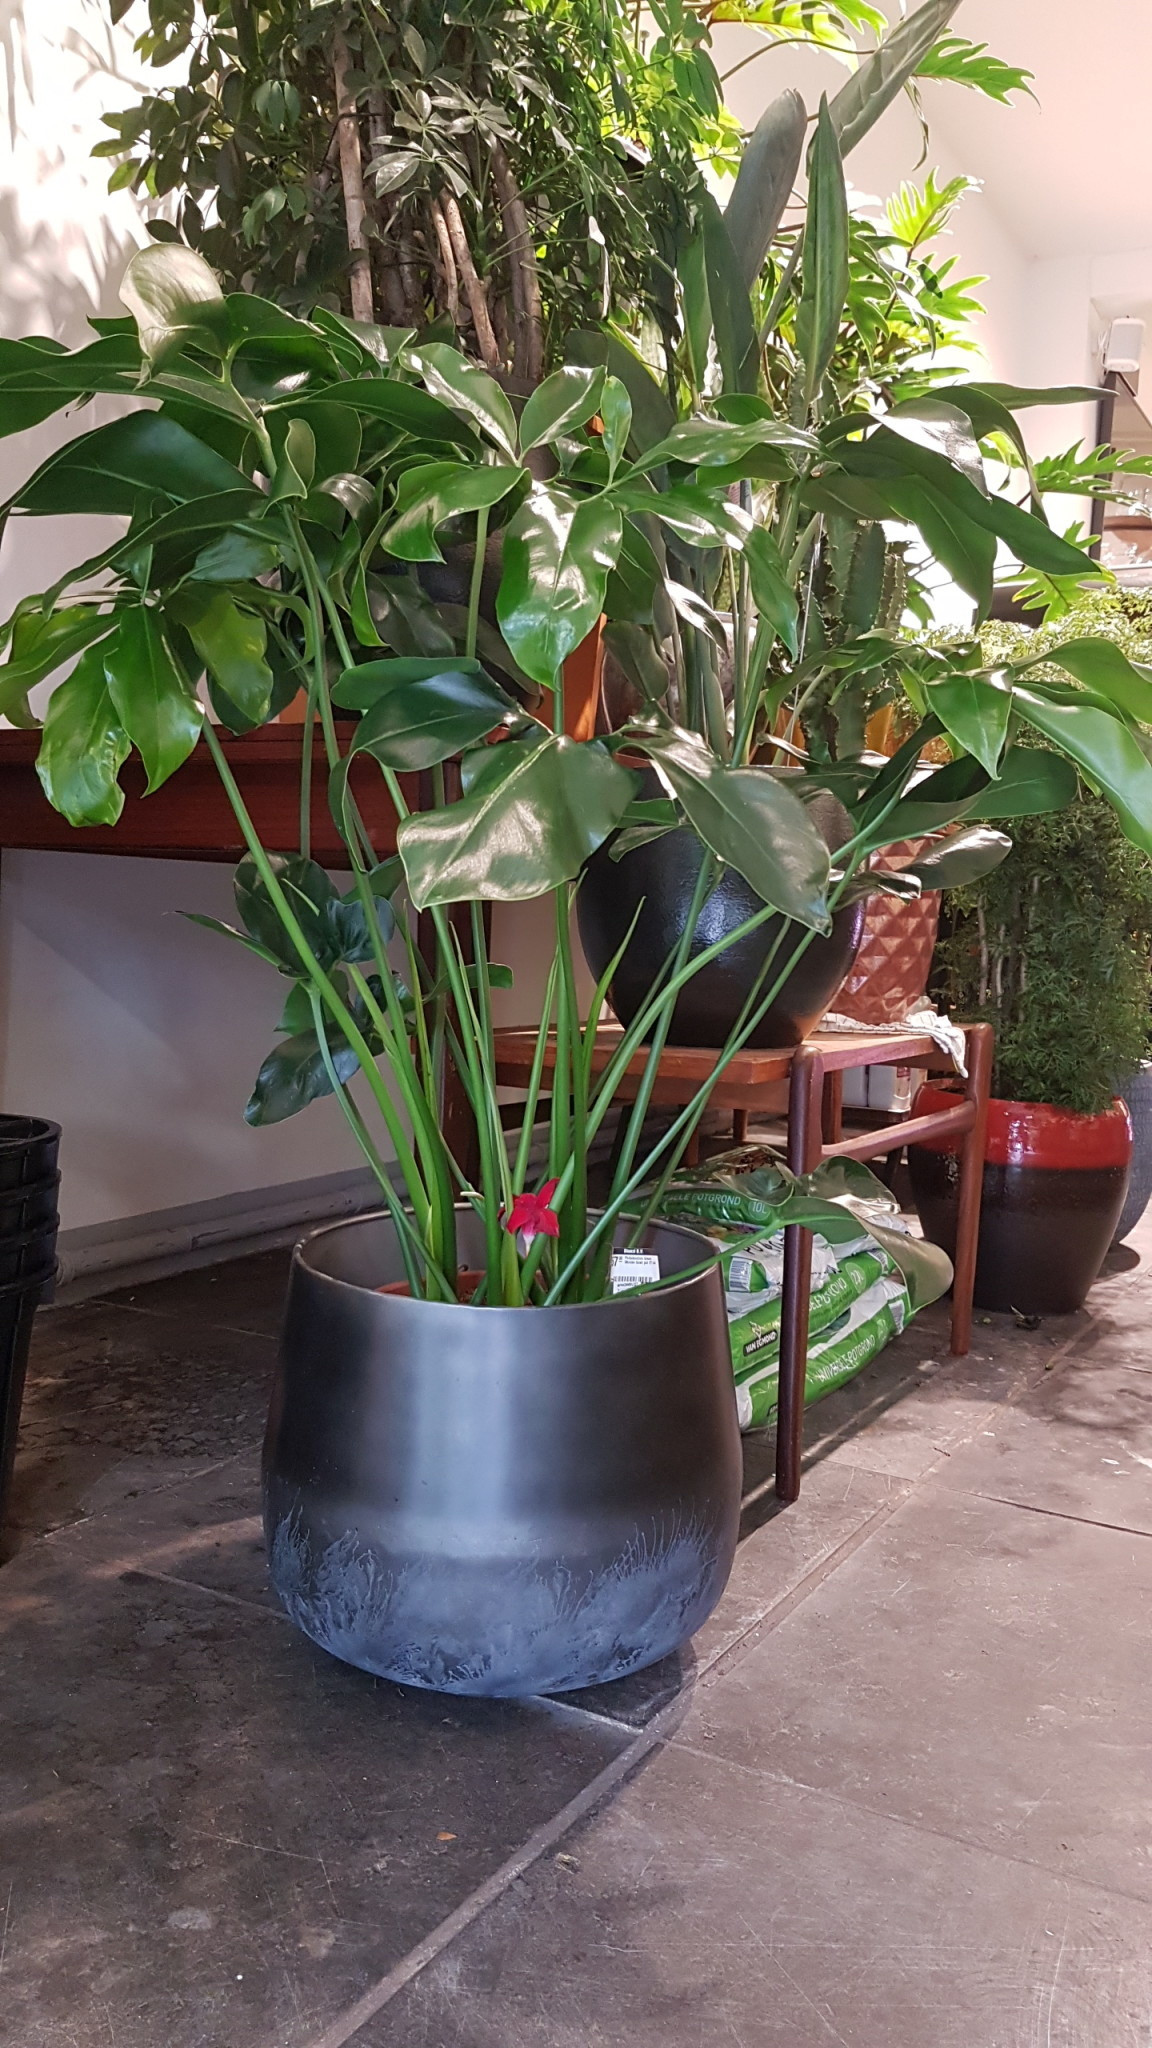 Philodendron Green Wonder bush pot 27 cm